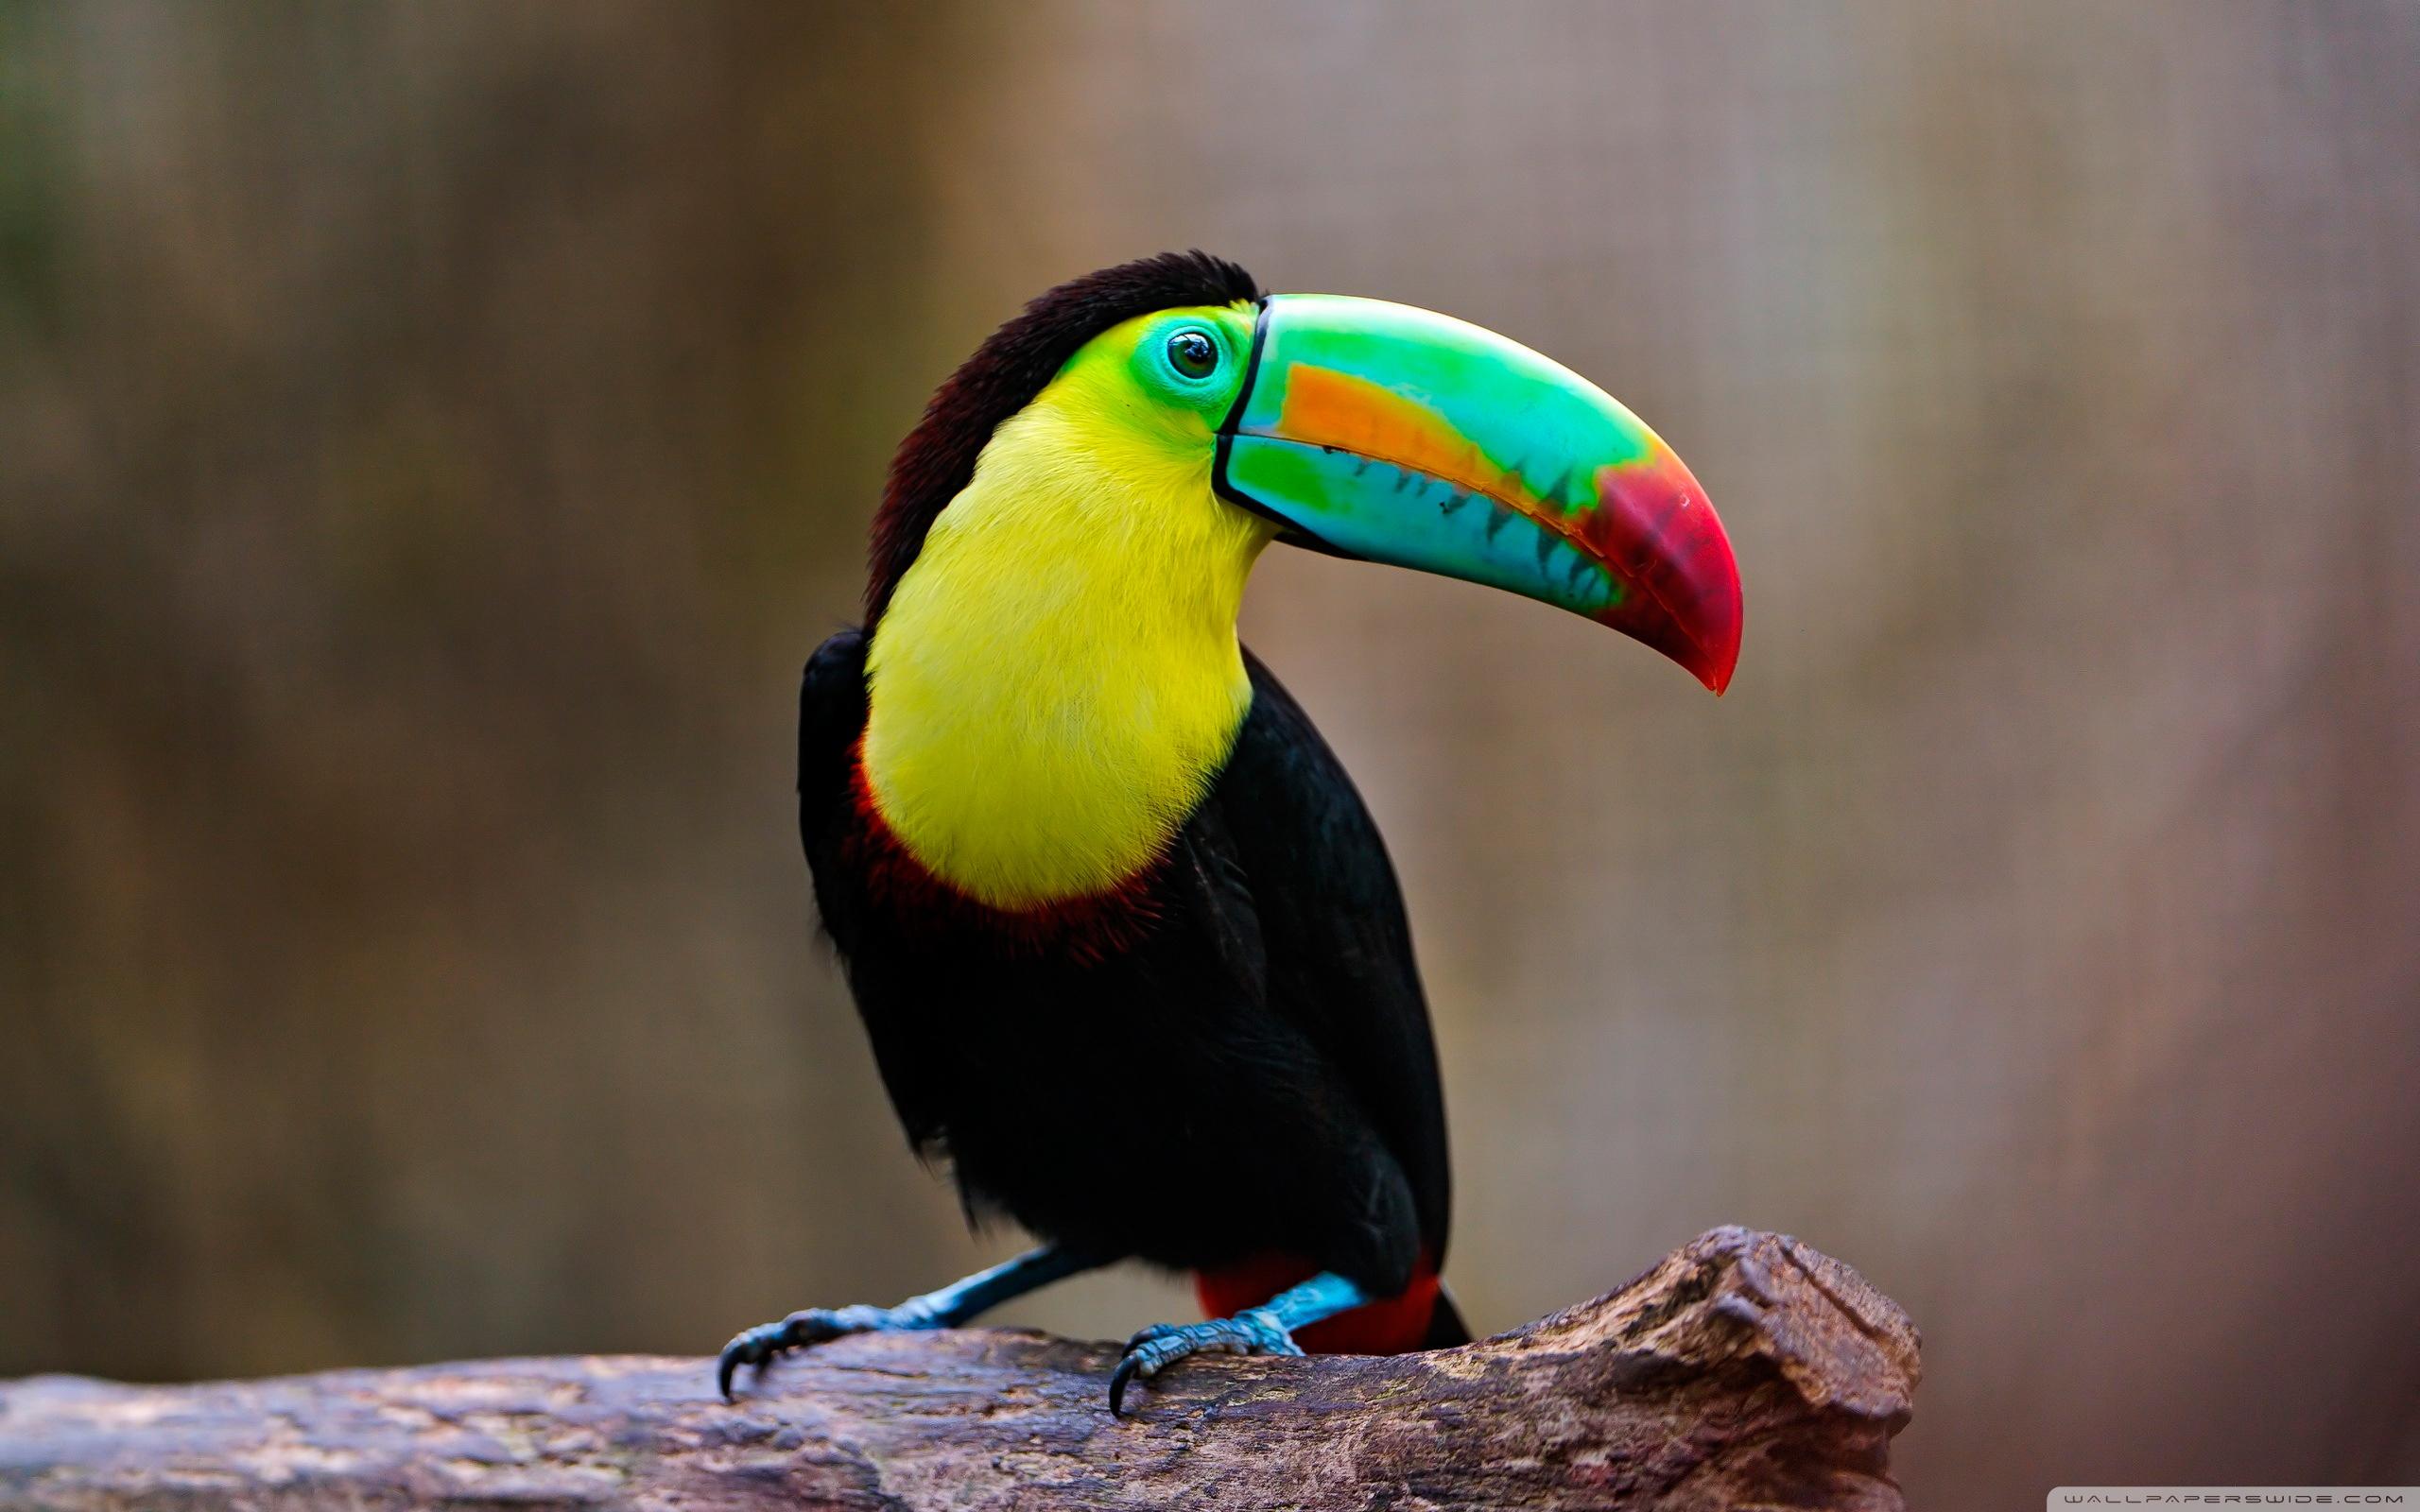 Toucan Bird 19909 1920x1200 px